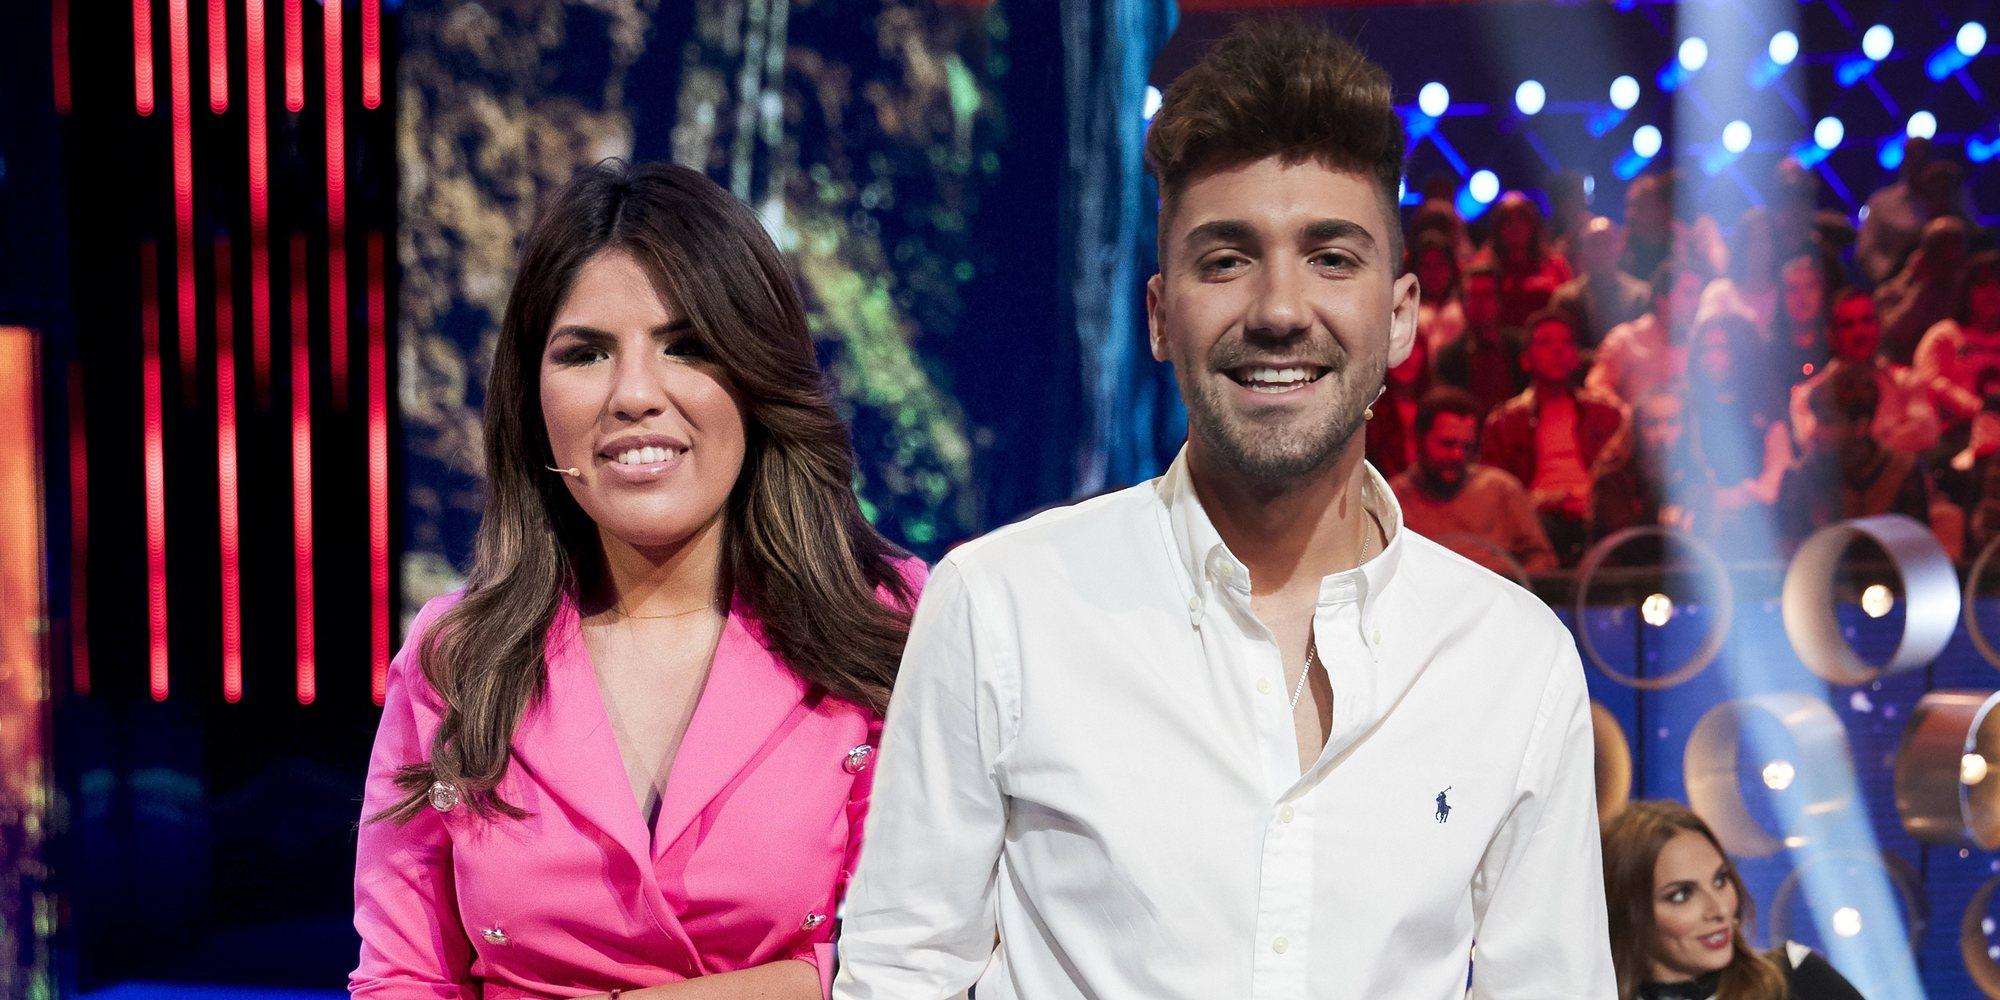 Alejandro Albalá reclama a Chabelita Pantoja 300.000 euros por daños morales